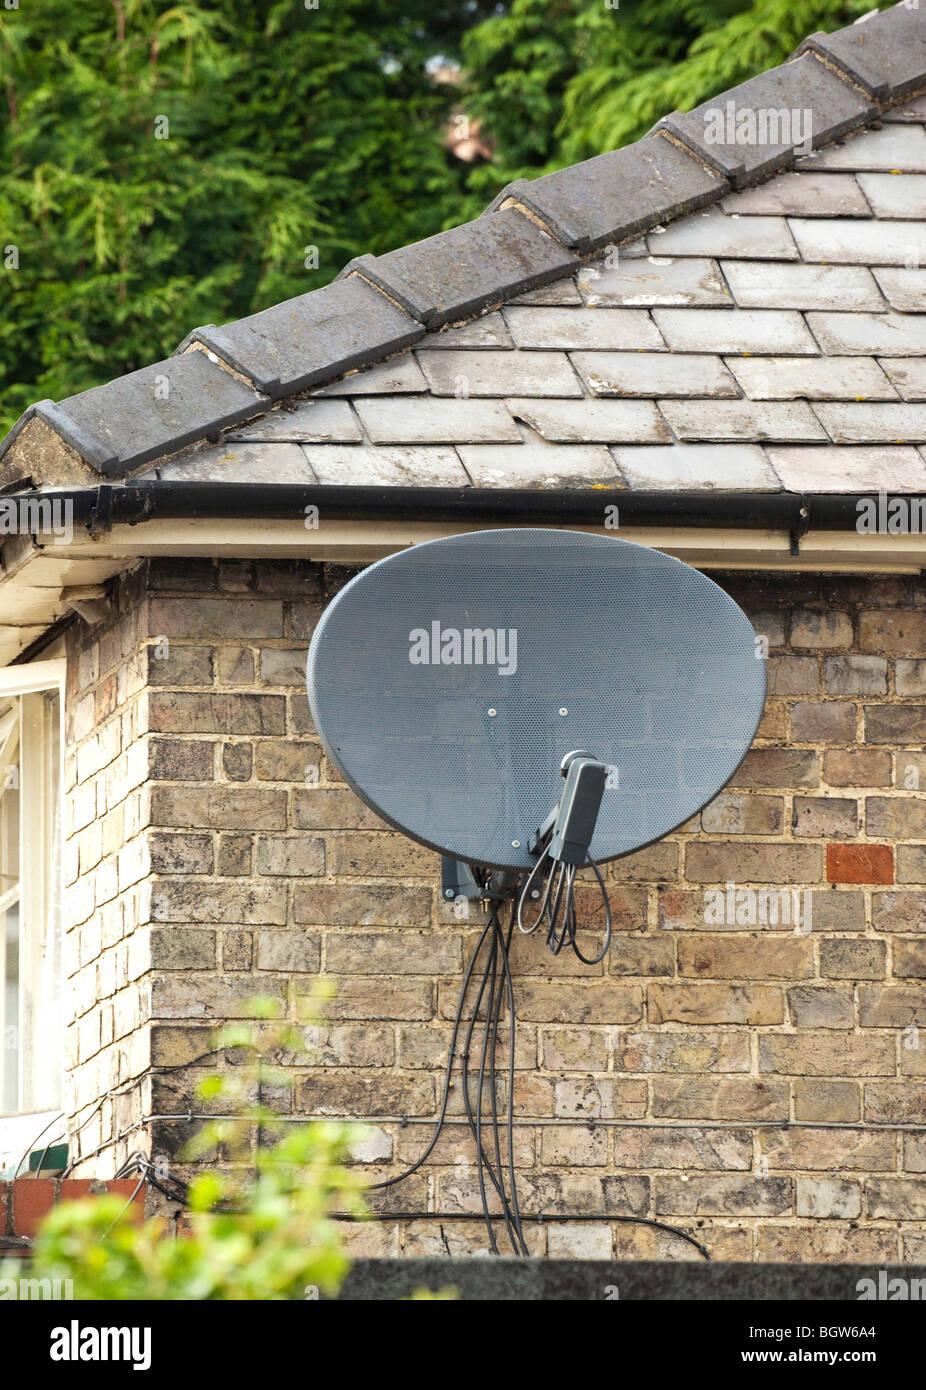 Sky digital tv via satellite dish Immagini Stock